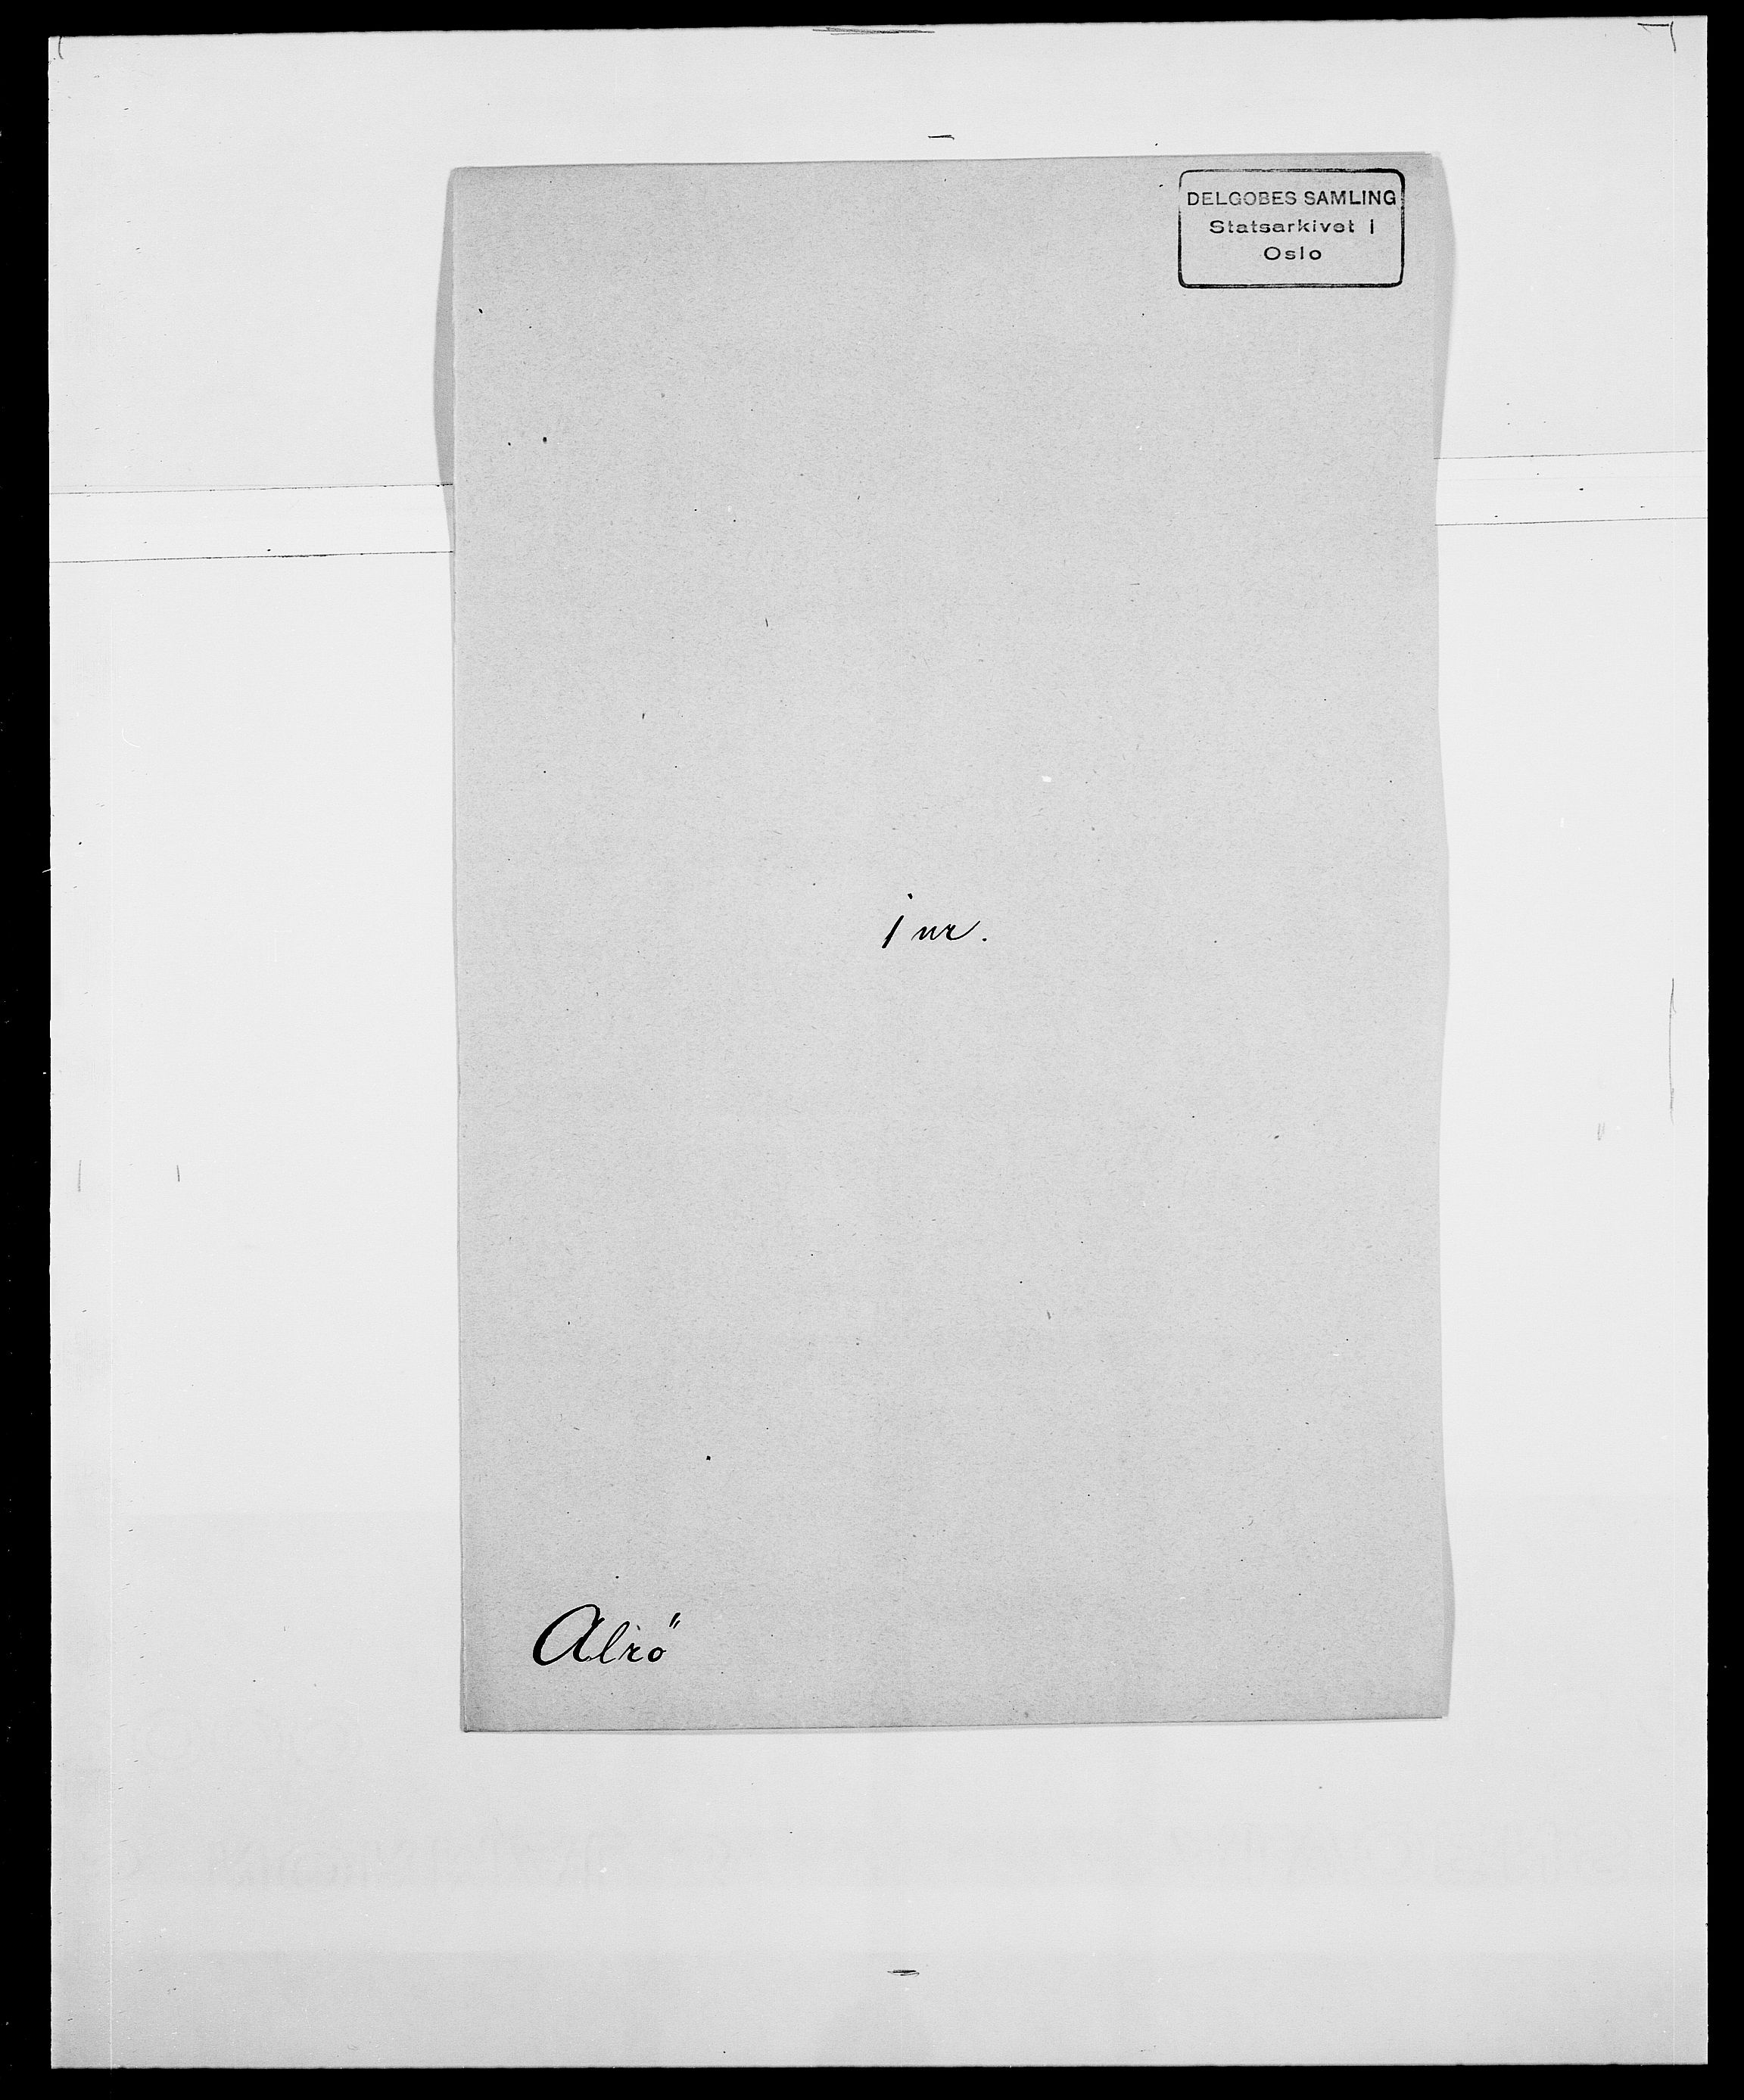 SAO, Delgobe, Charles Antoine - samling, D/Da/L0001: Aabye - Angerman, s. 452